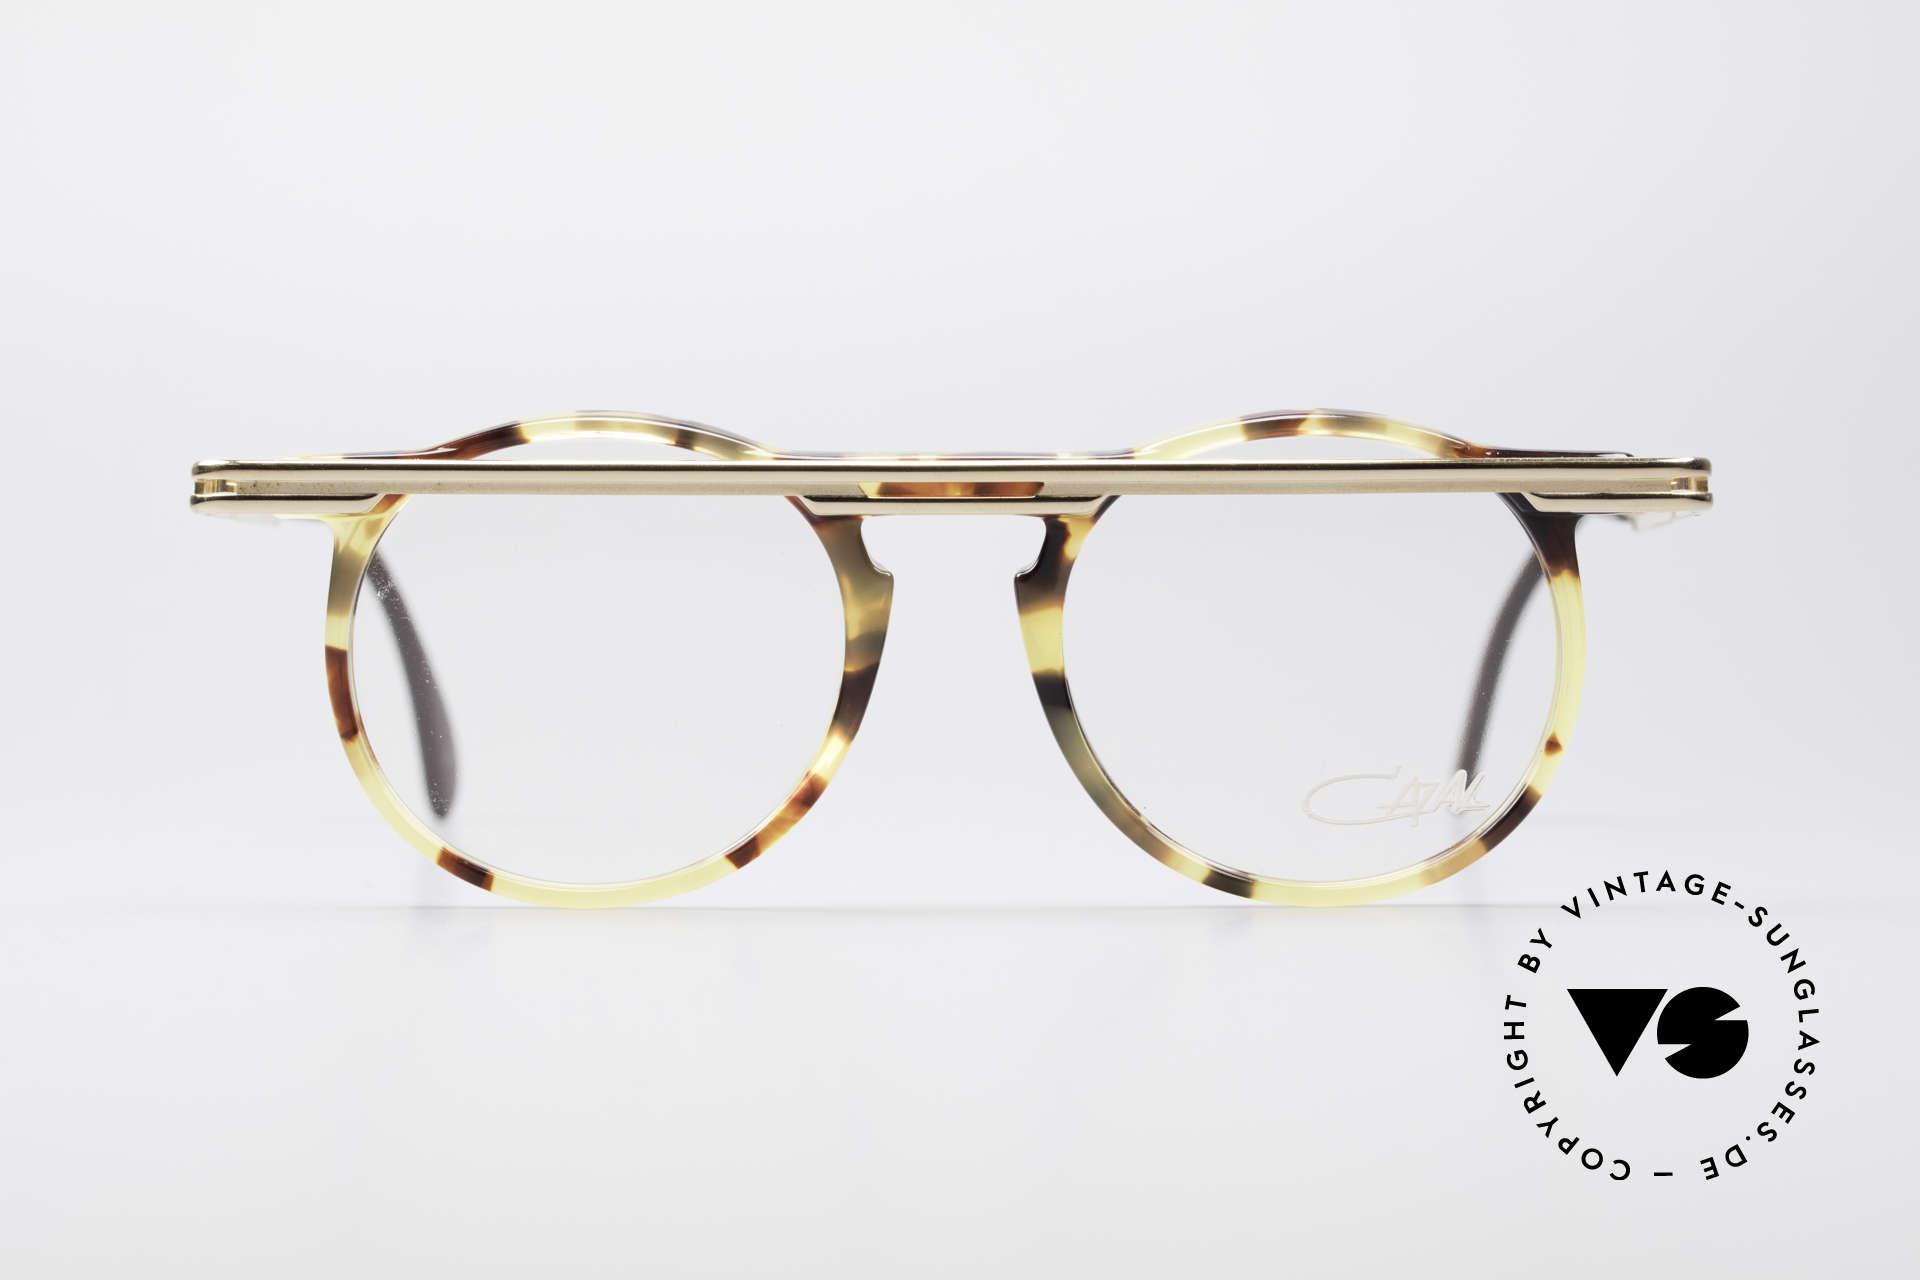 Cazal 648 True 90's Cari Zalloni Glasses, worn by the designer - Cari Zalloni (see the booklet), Made for Men and Women